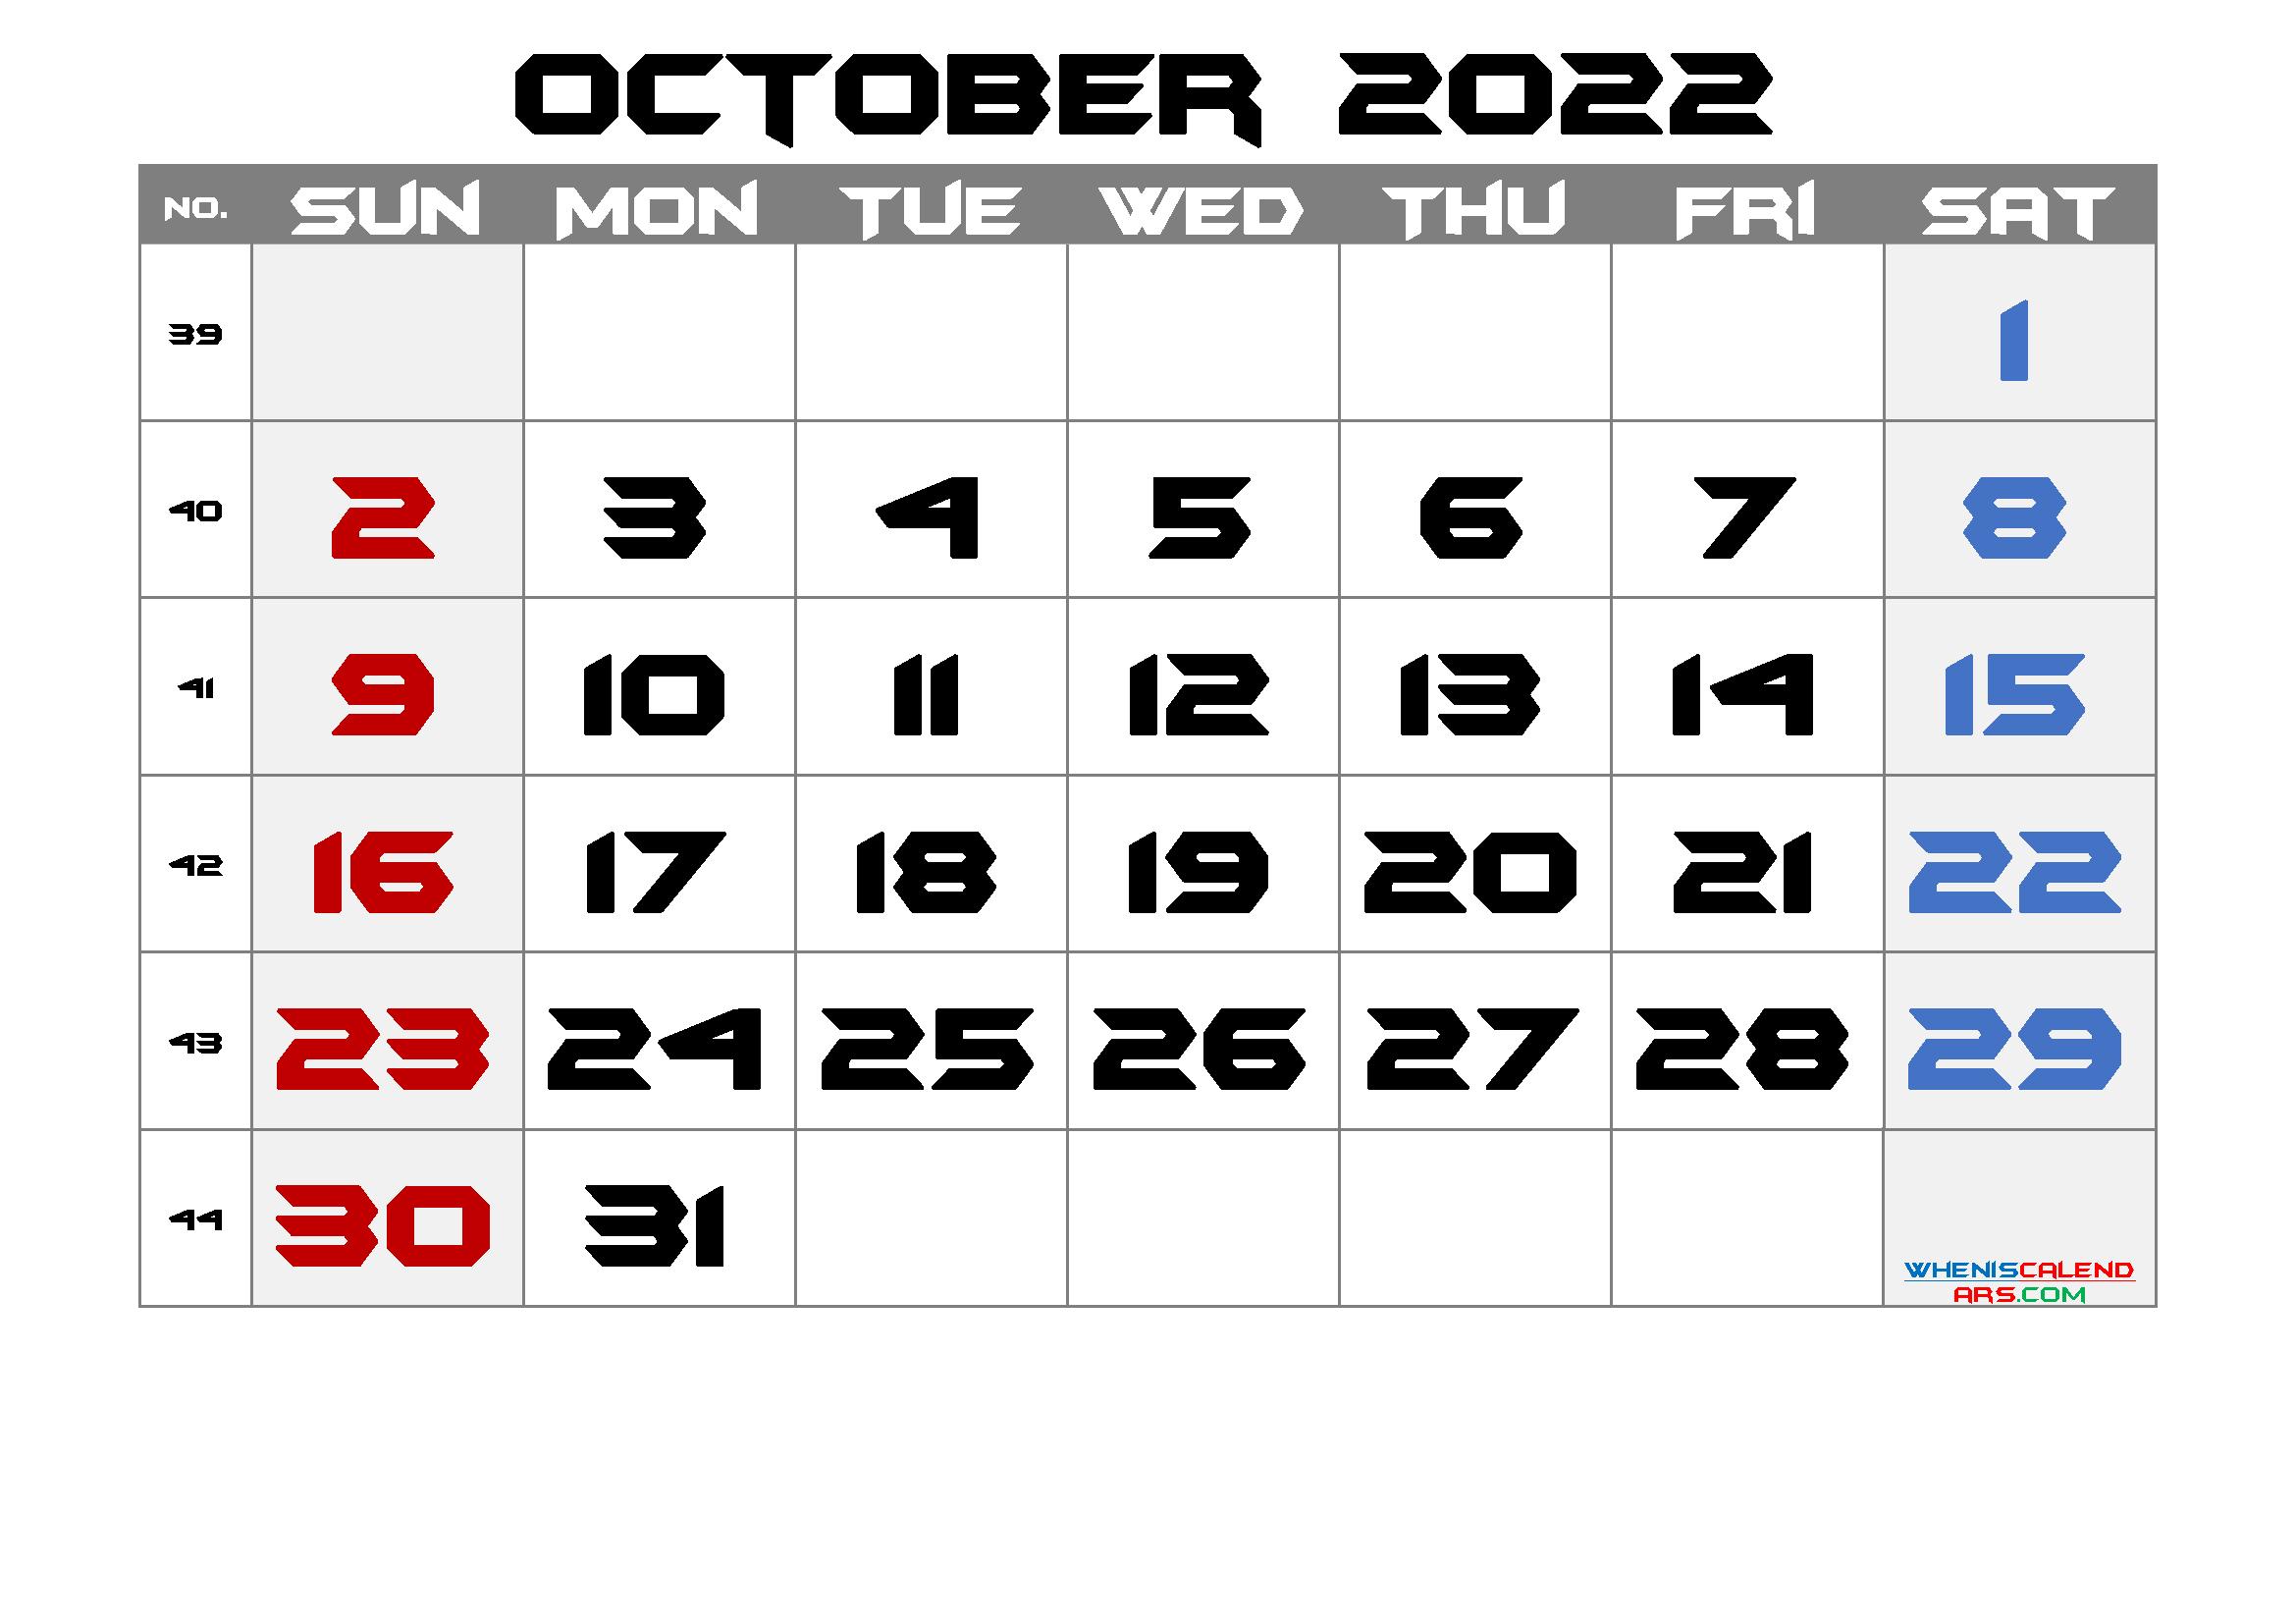 Oct 2022 Calendar Printable.Free Printable Calendar 2022 October 6 Templates Calendar Printables Monthly Calendar Printable 2021 Calendar